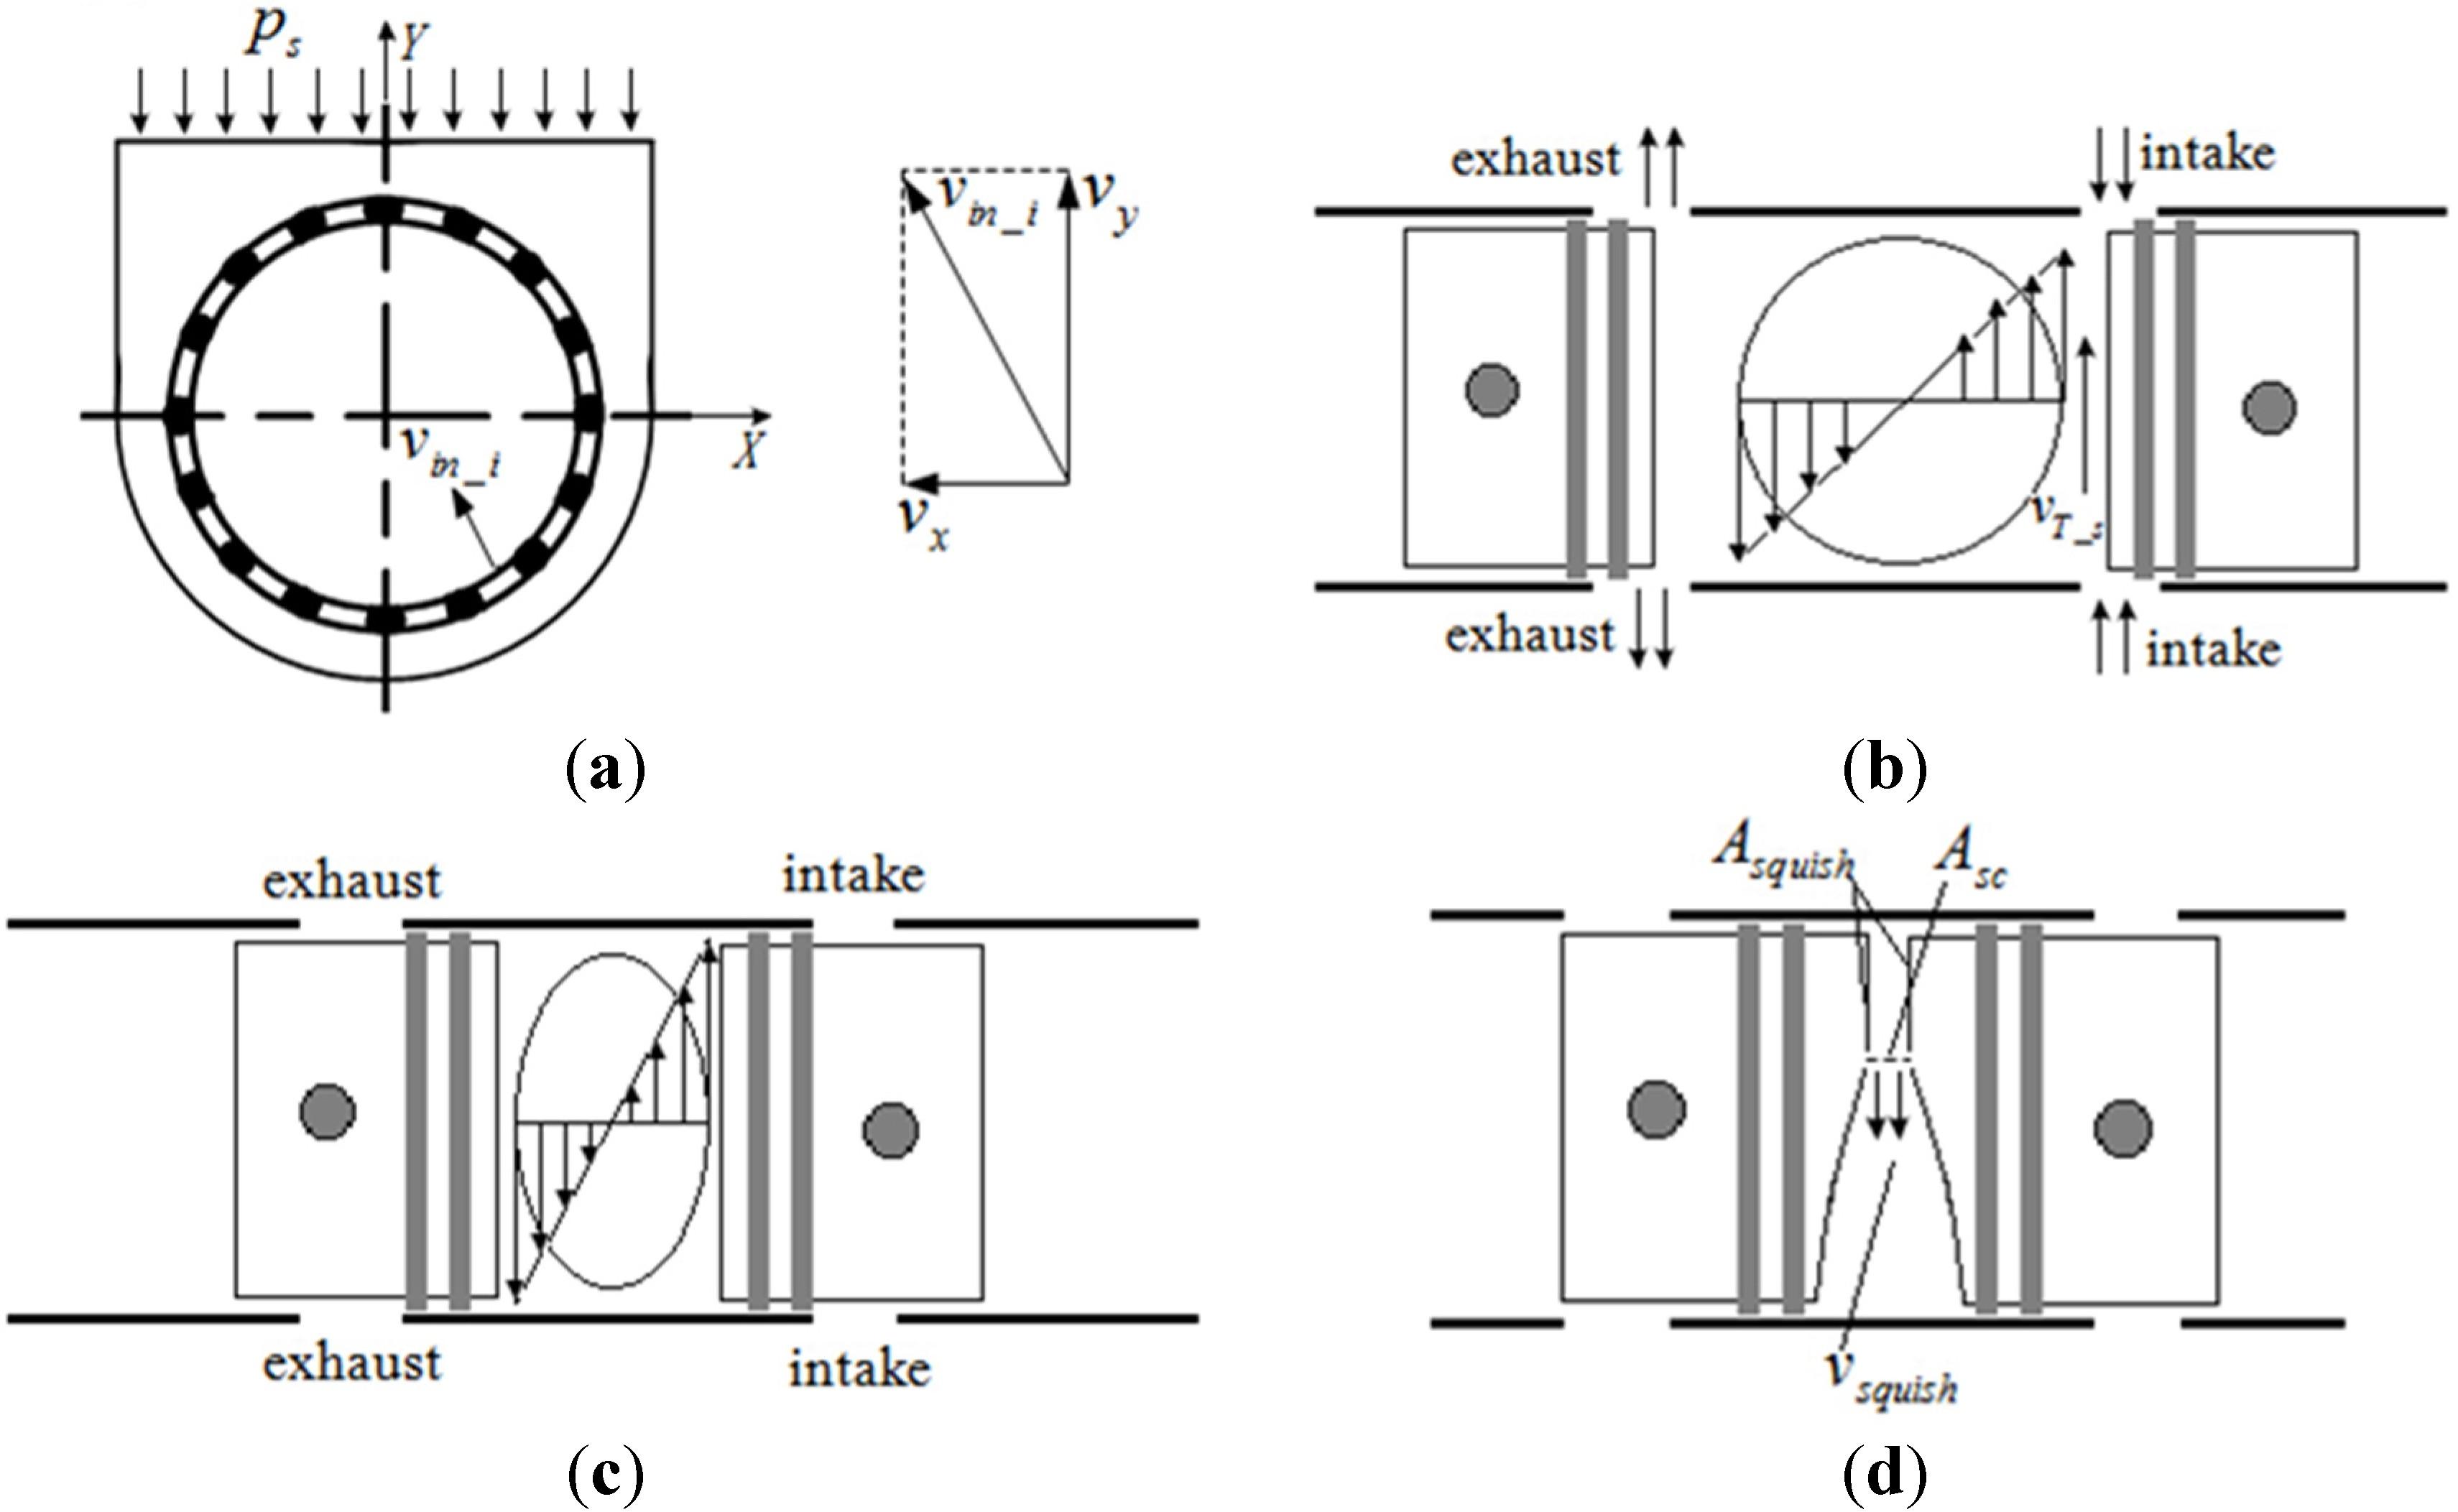 Two Stroke Engine Cycle Diagram Energies Free Full Text Of Two Stroke Engine Cycle Diagram